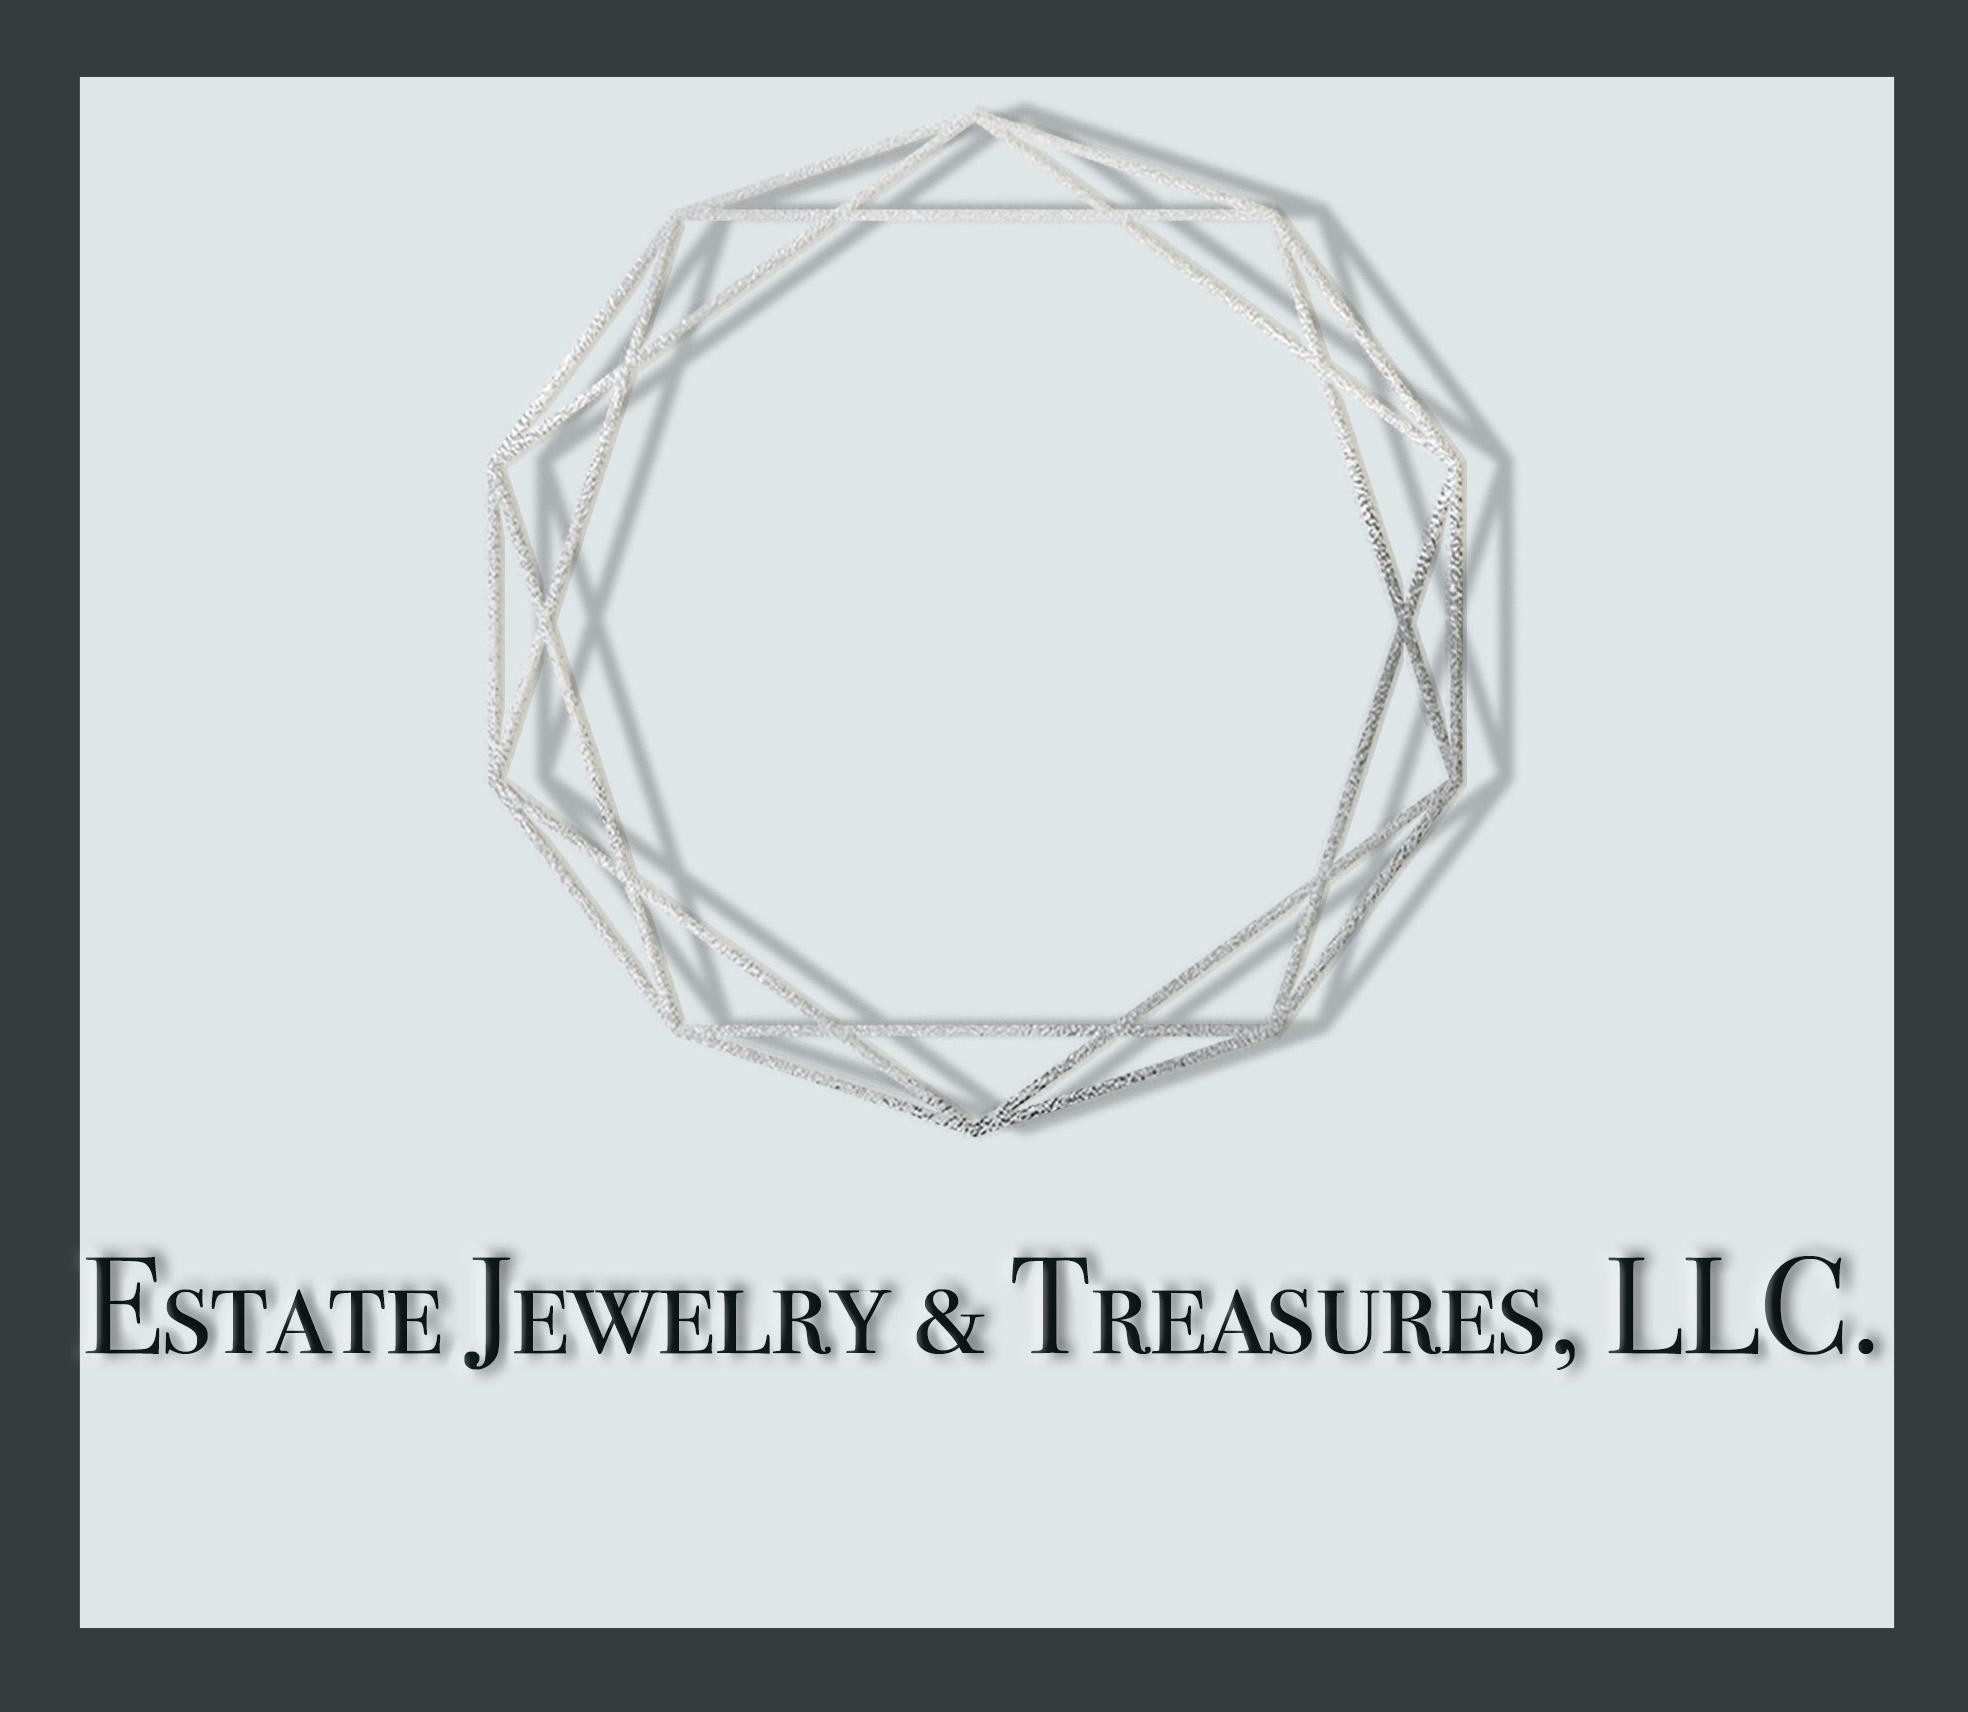 Estate Jewelry & Treasures, LLC